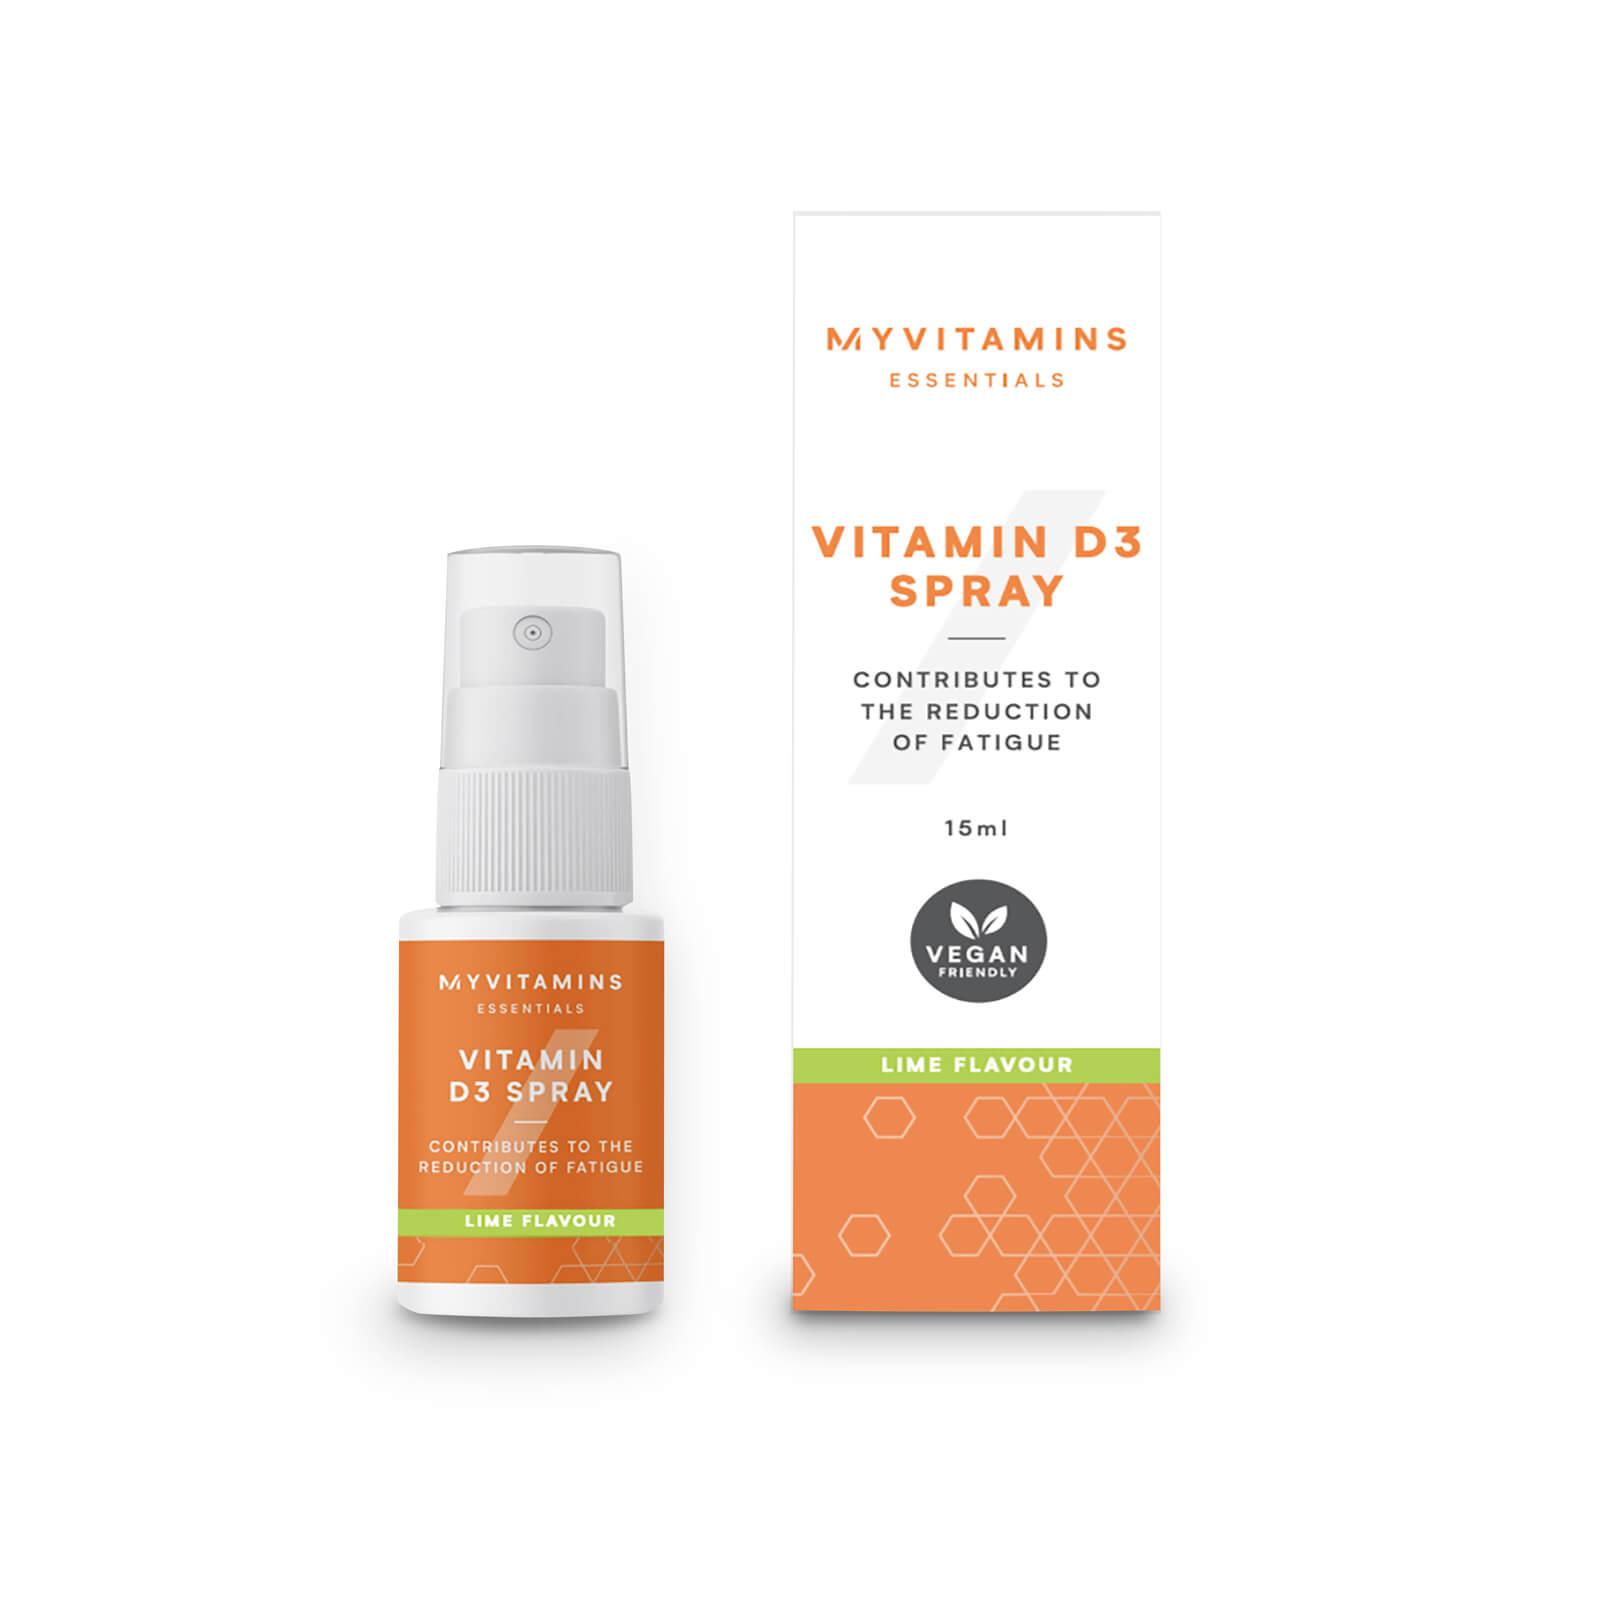 myvitamins Vegan Vitamin D3 Spray